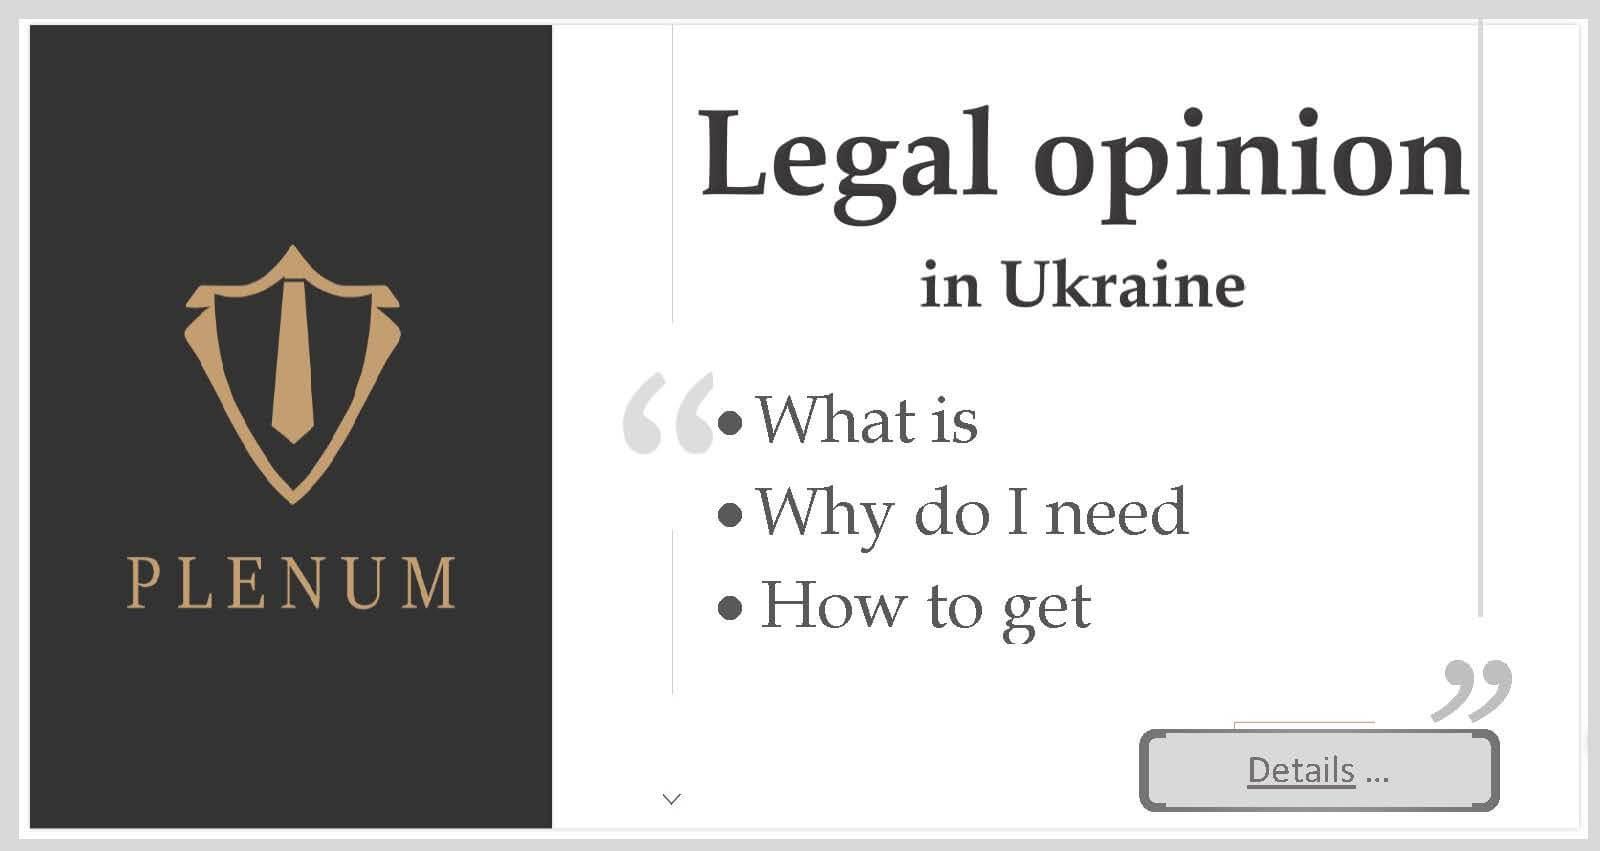 Legal Opinion in Ukraine